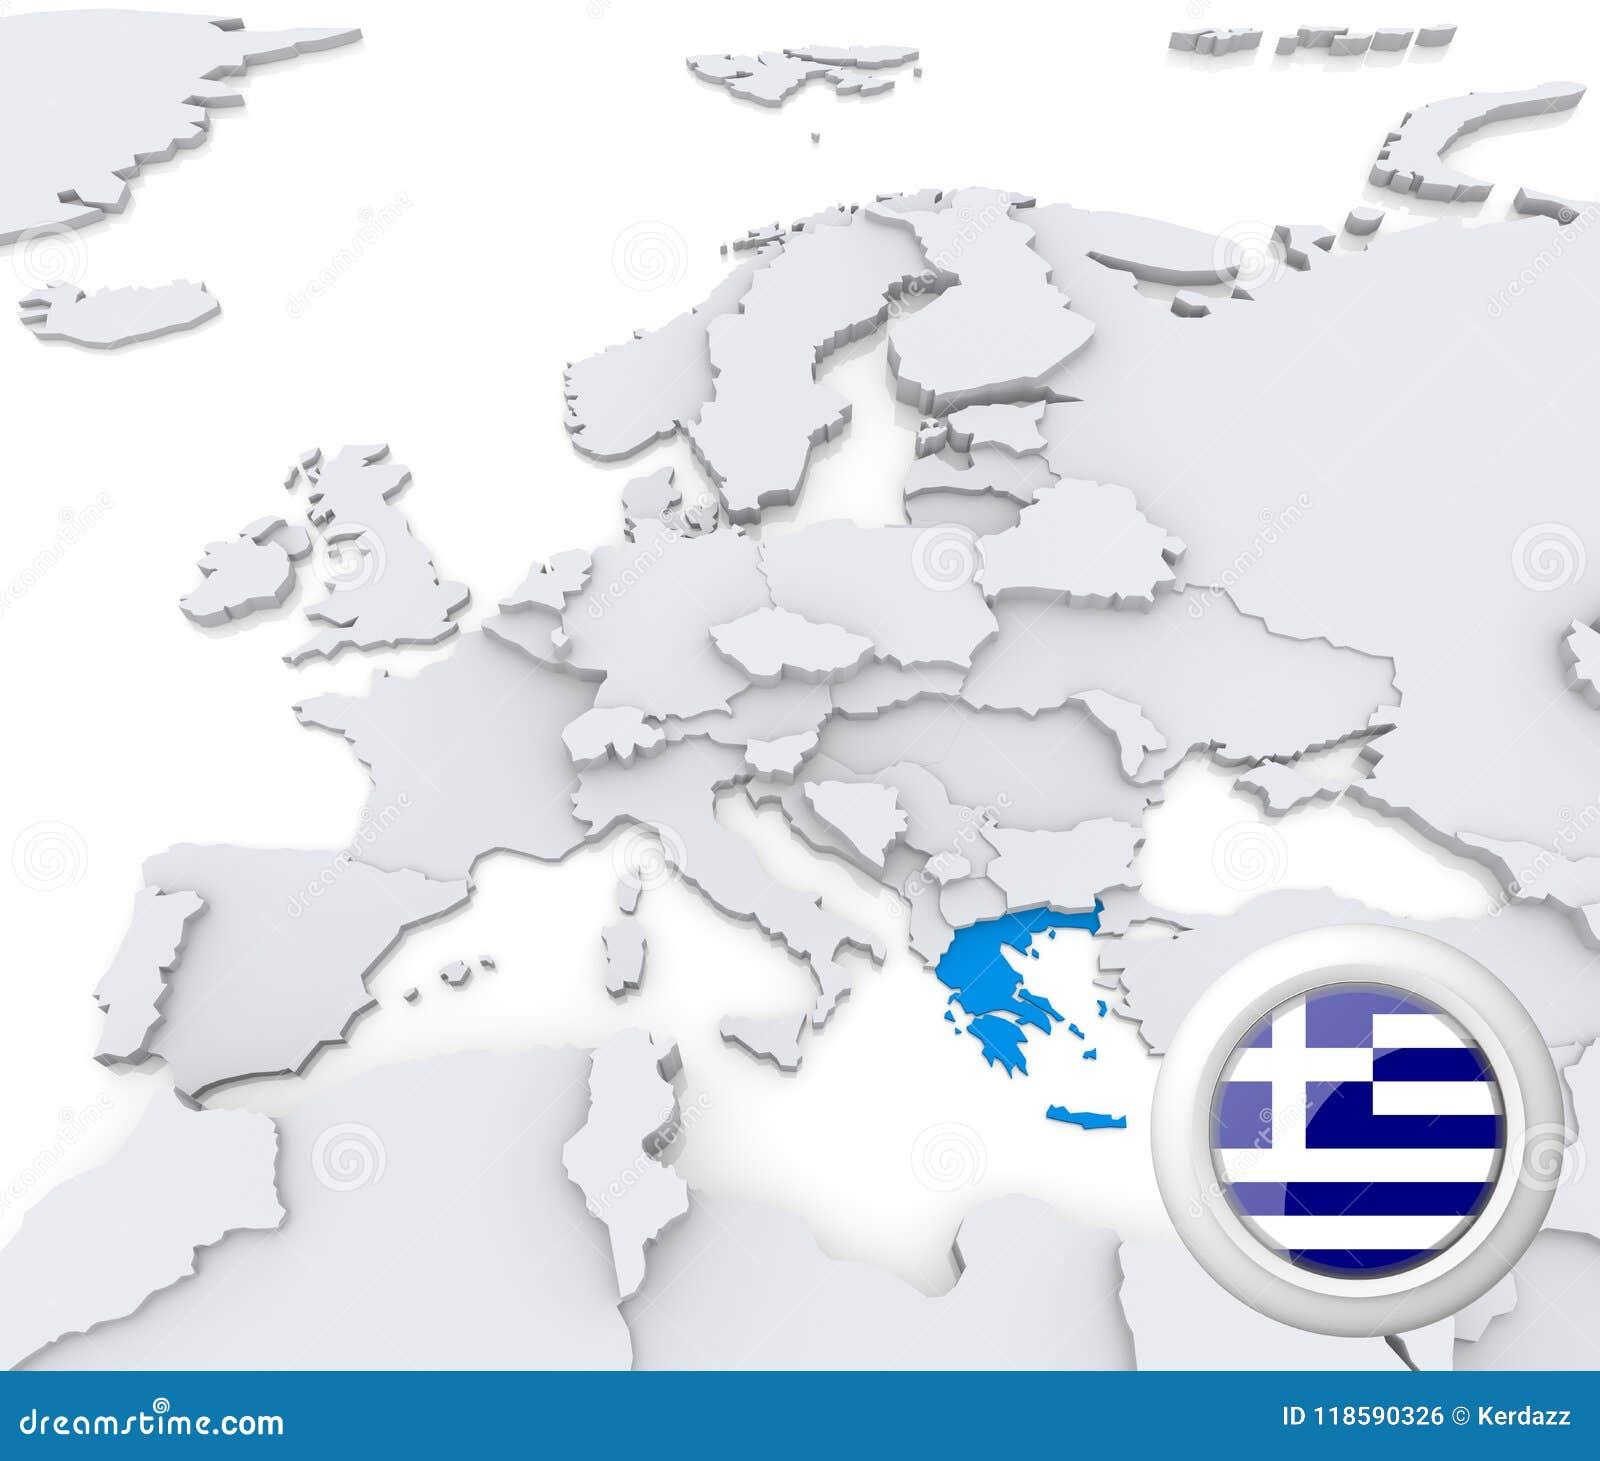 Greece Map Europe.Greece On Map Of Europe Stock Illustration Illustration Of Emblem